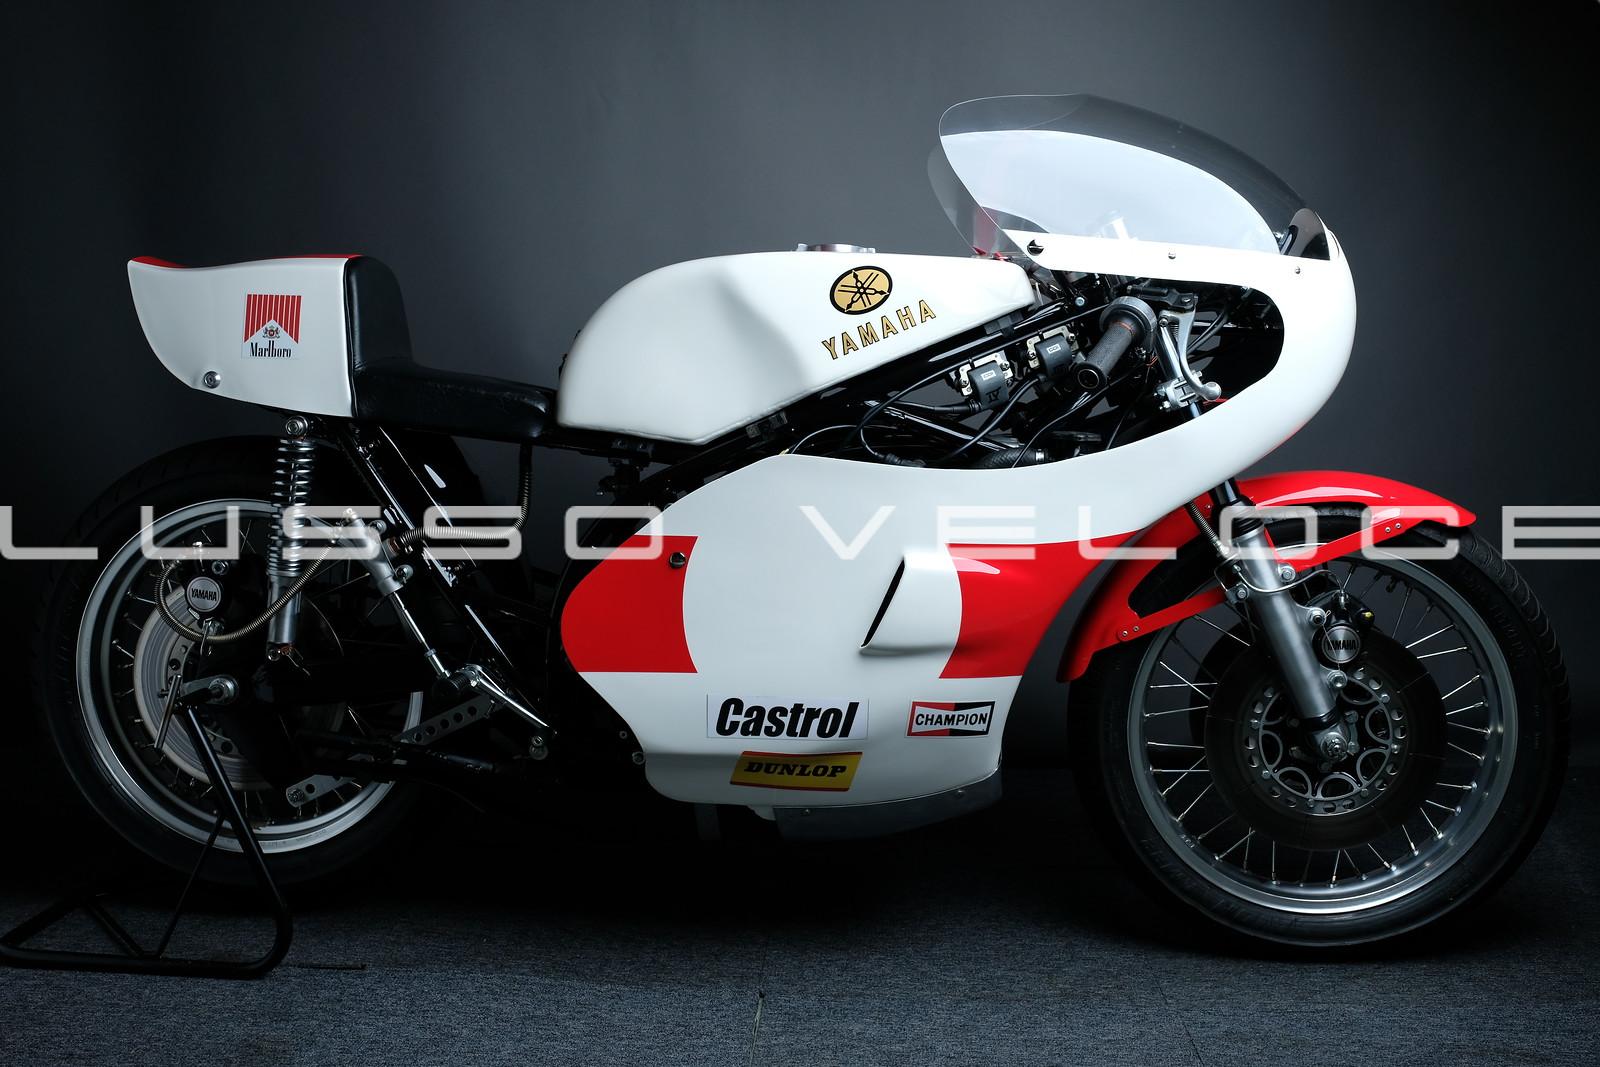 Yamaha TZ 750 C